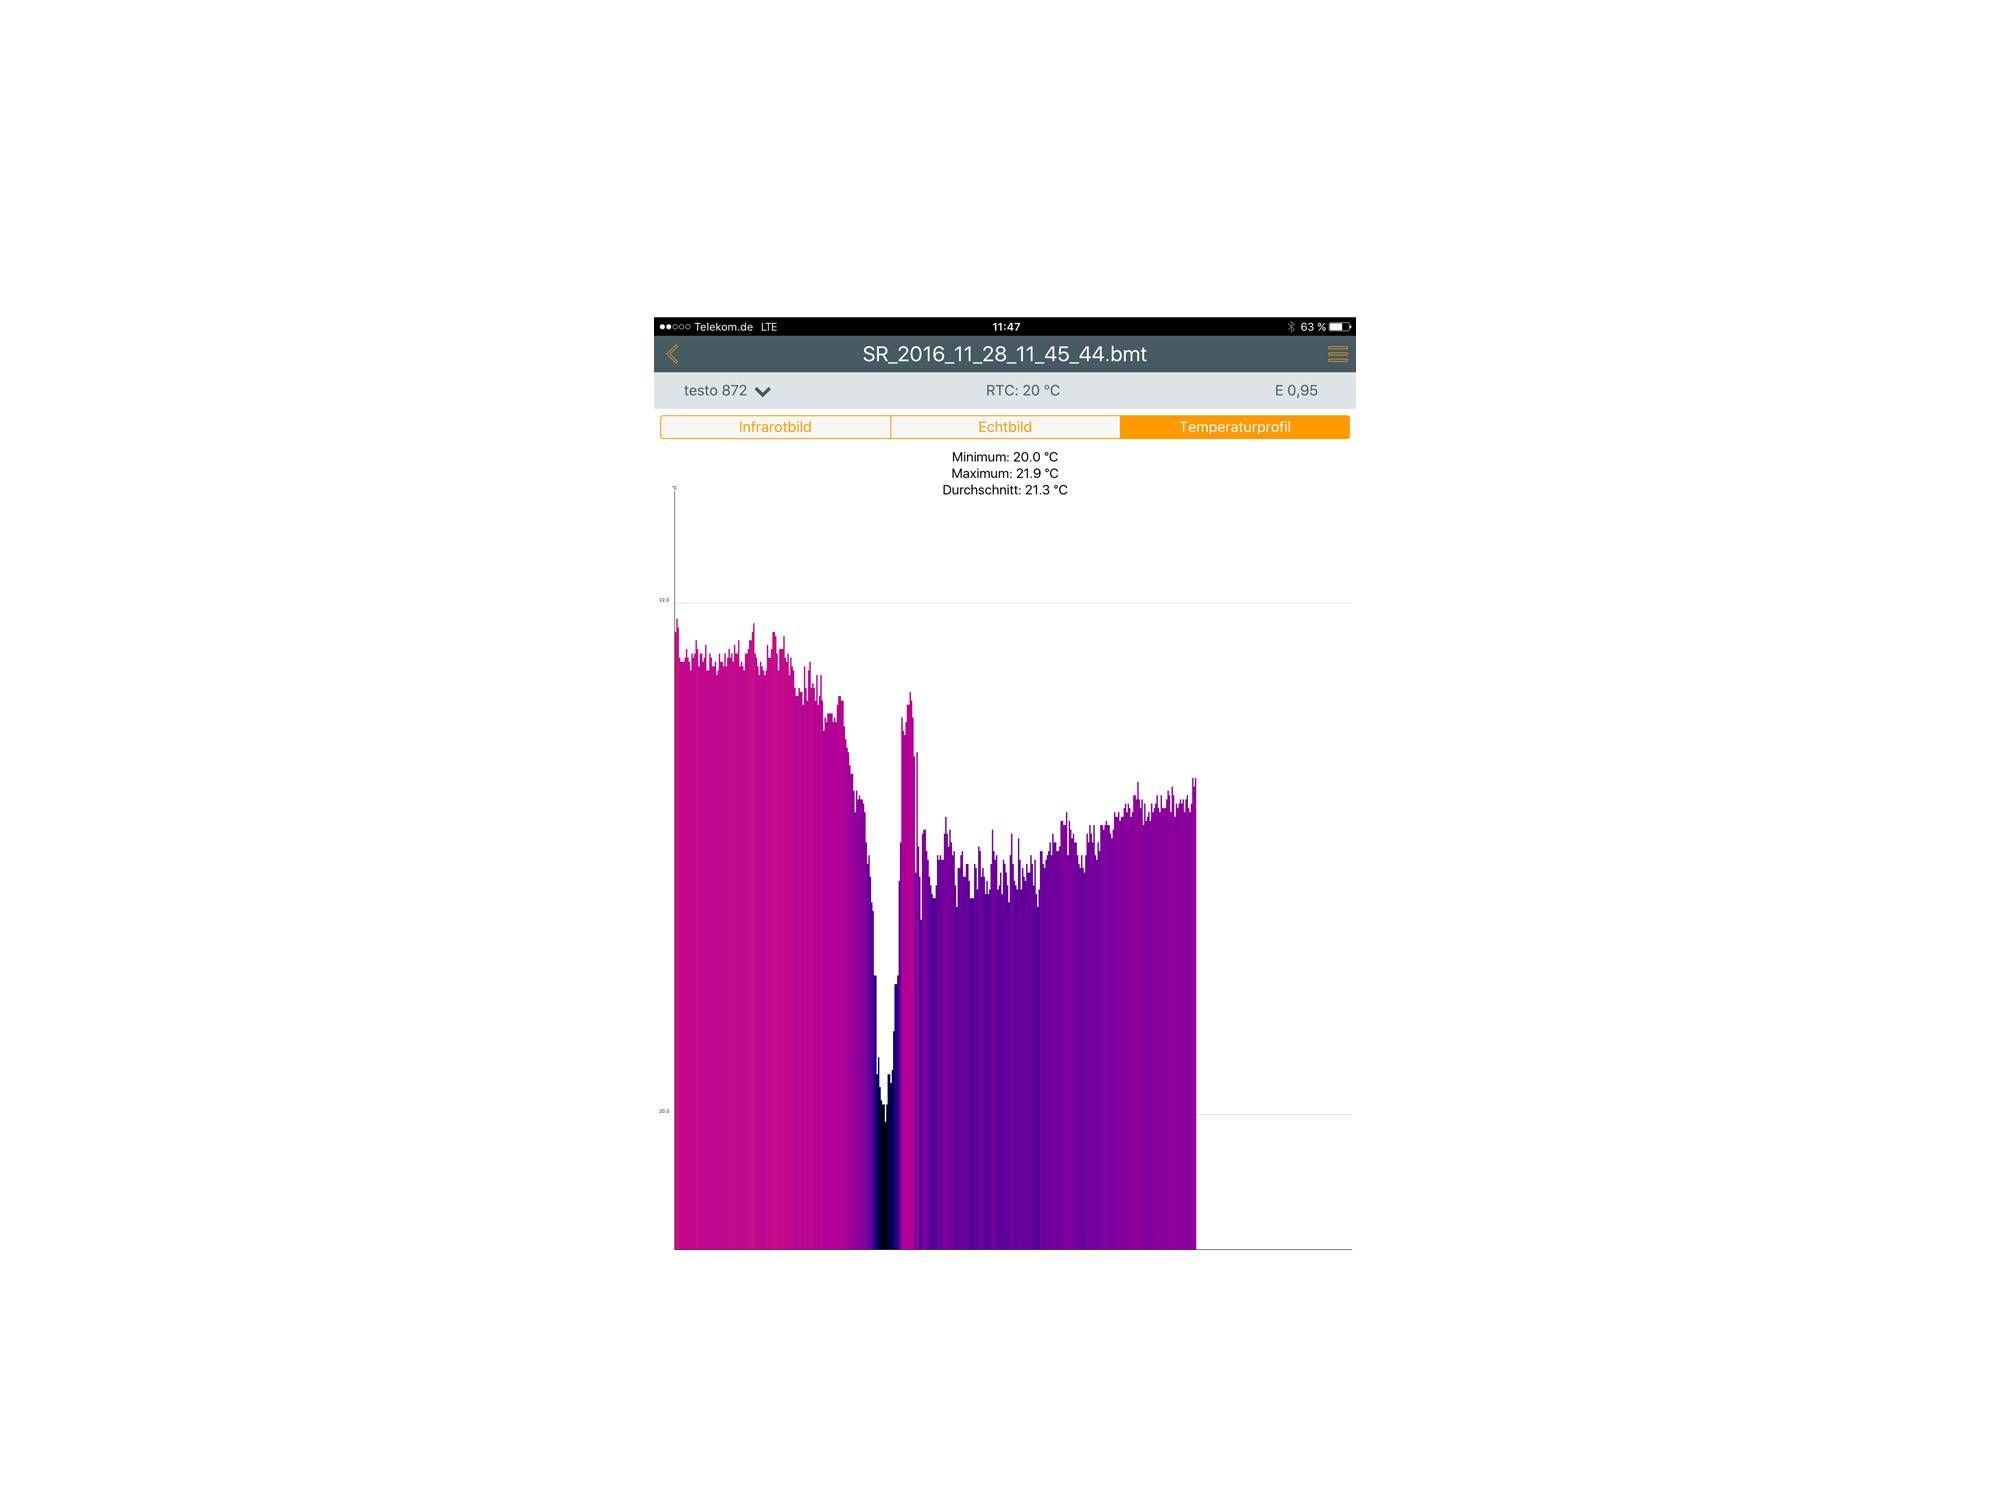 thermography-app-analyse-temperaturverlauf.jpg